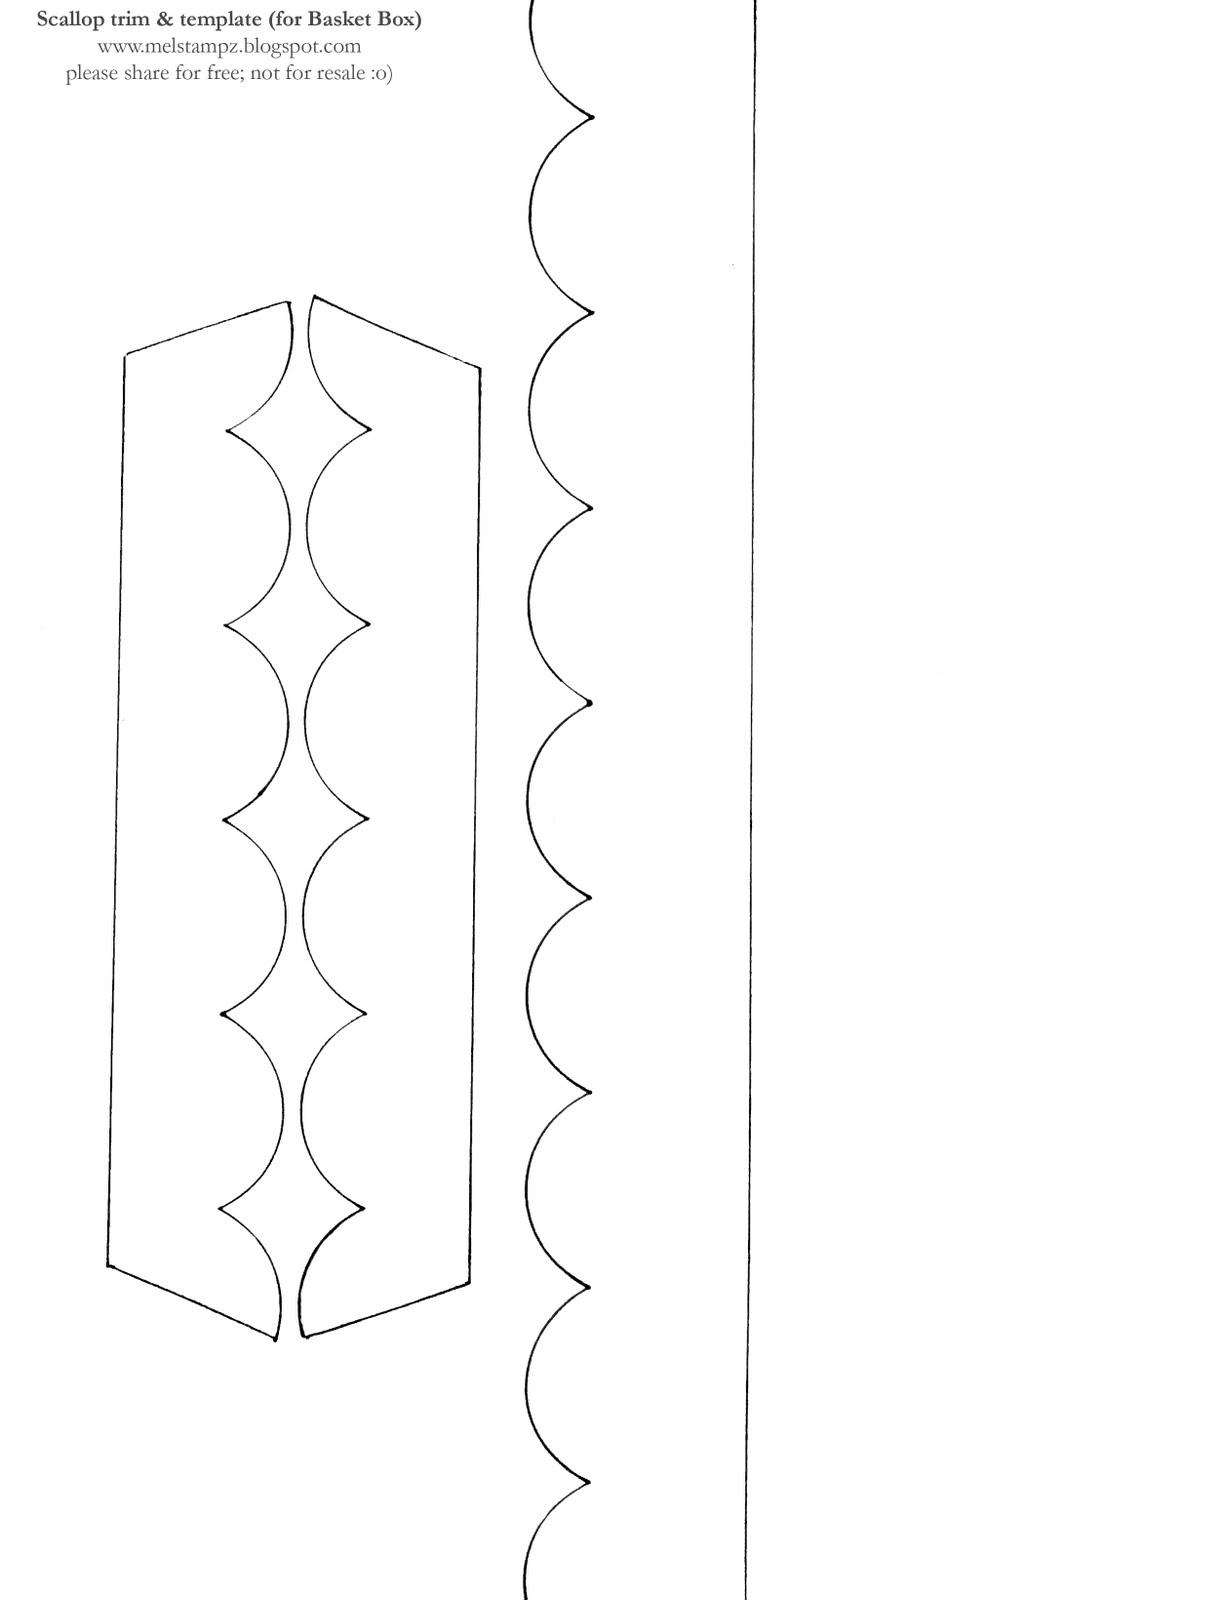 [scallopTRIM+template(forBasketBOX)_melstampz.jpg]